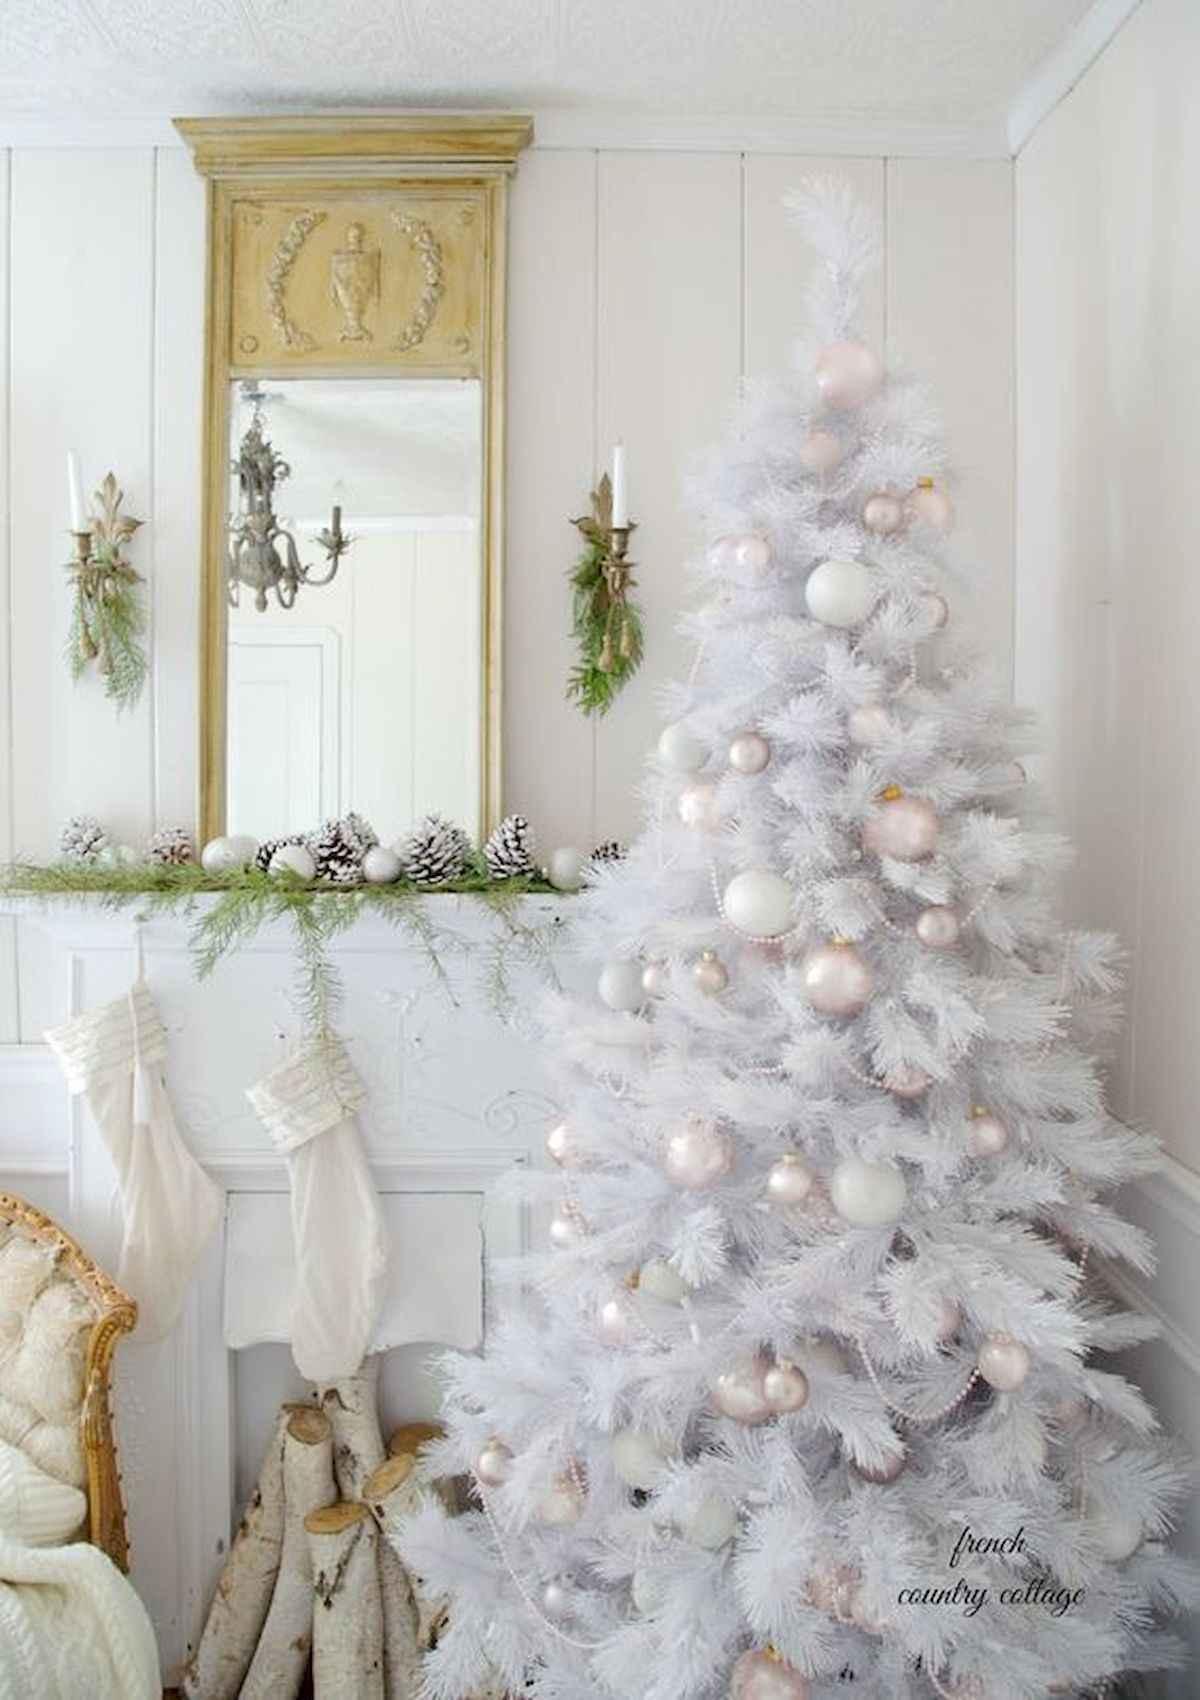 40 elegant christmas tree decorations ideas (10)